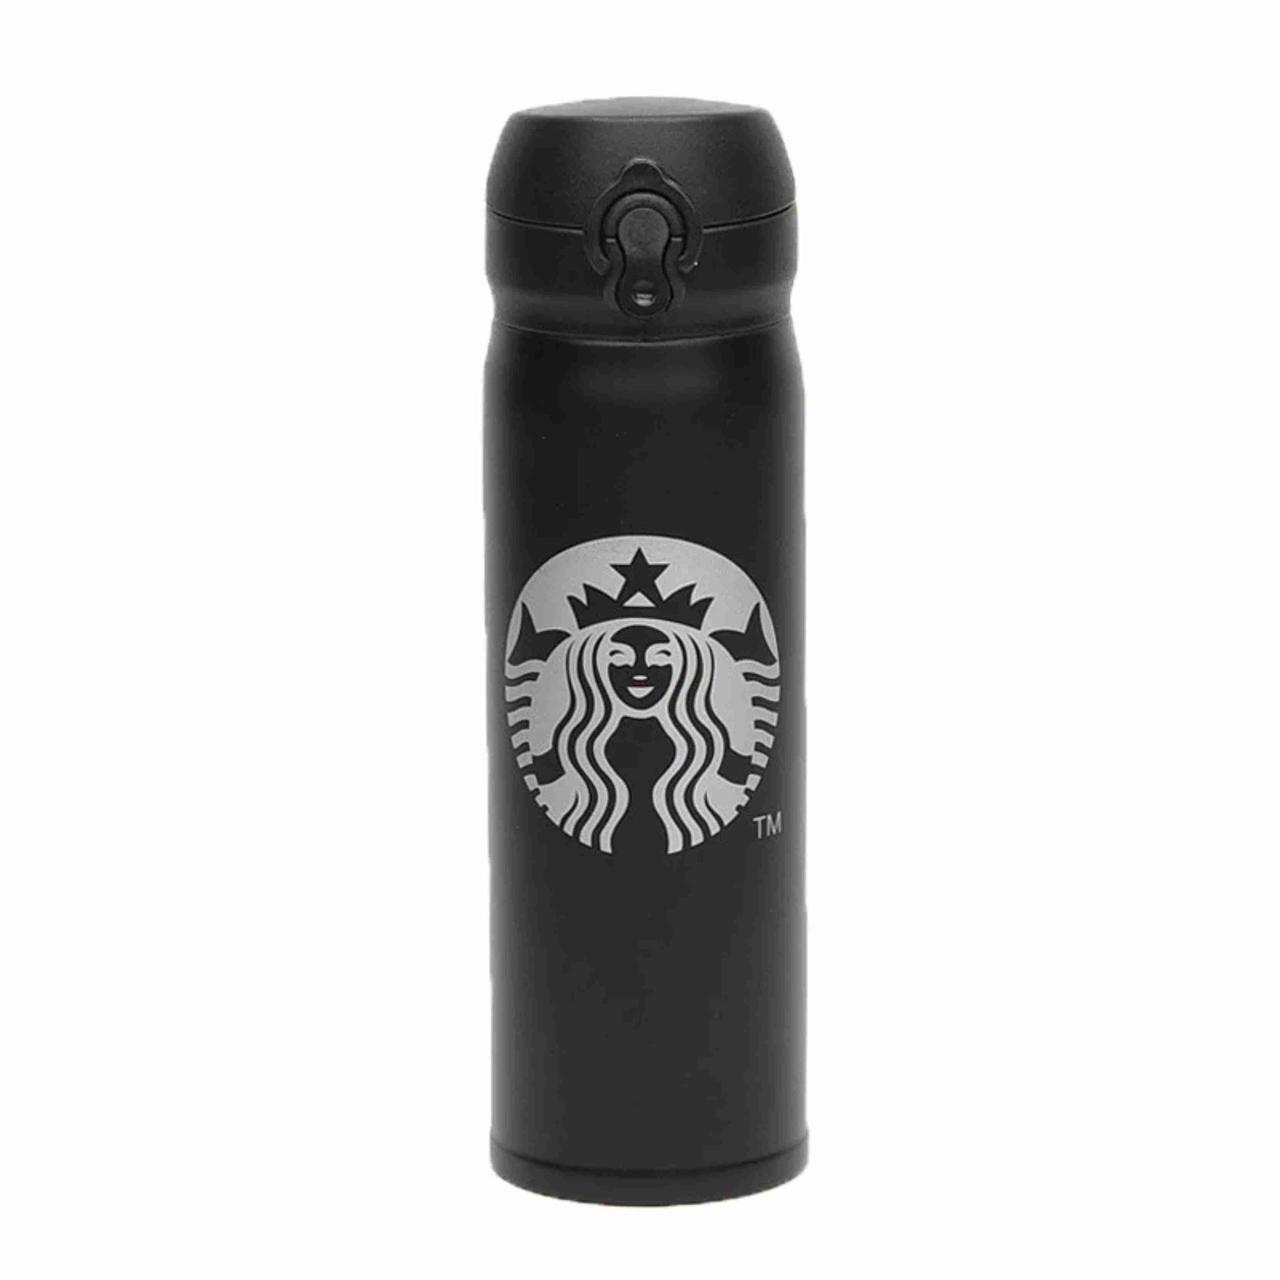 Термоc Starbucks STN-2 ЧЕРНЫЙ / термокружка / Термос